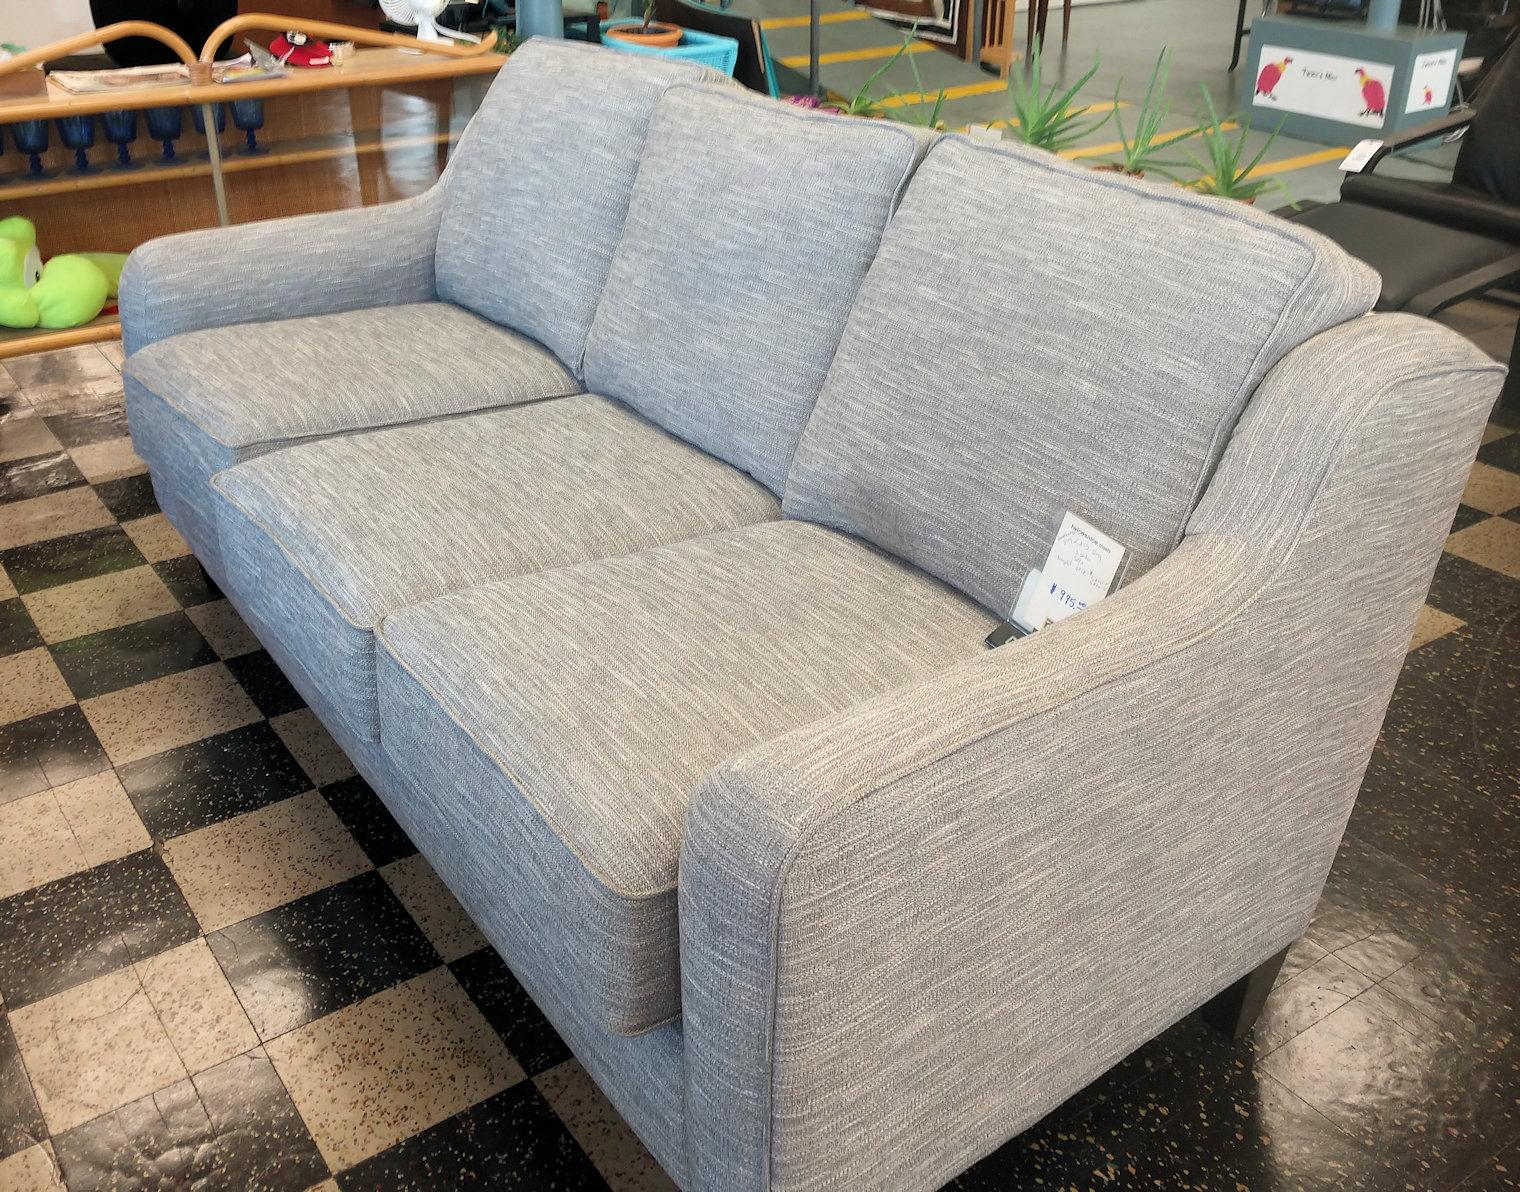 LR0238-La-Z-Boy-Sofa-angle